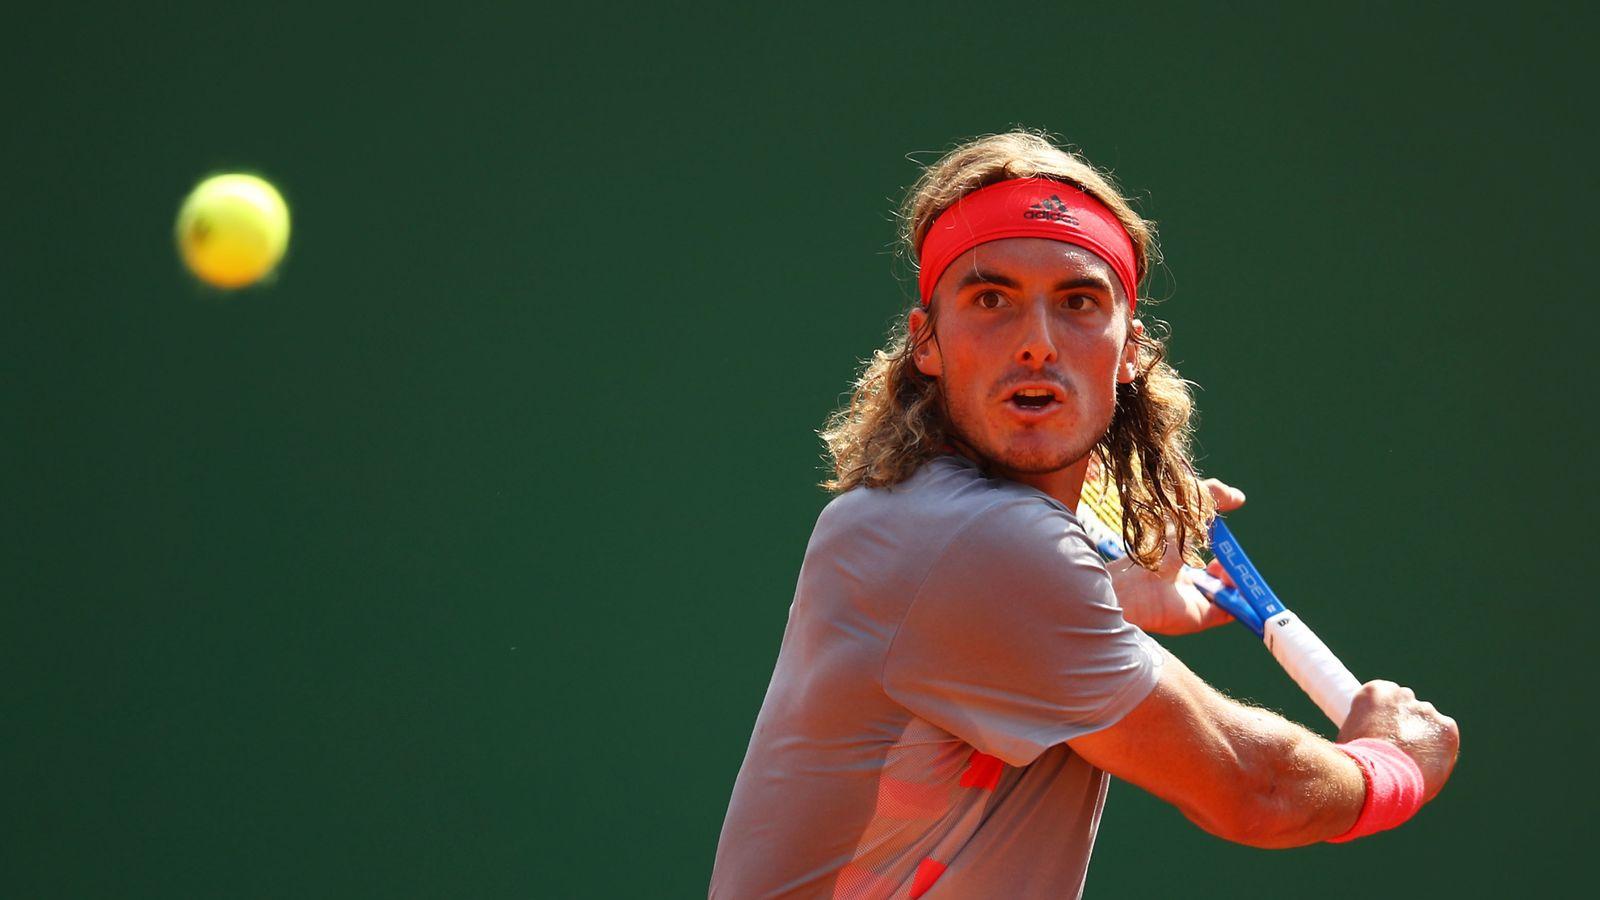 Stefanos Tsitsipas Wins Estoril Open To Claim Third Atp Title Tennis News Sky Sports